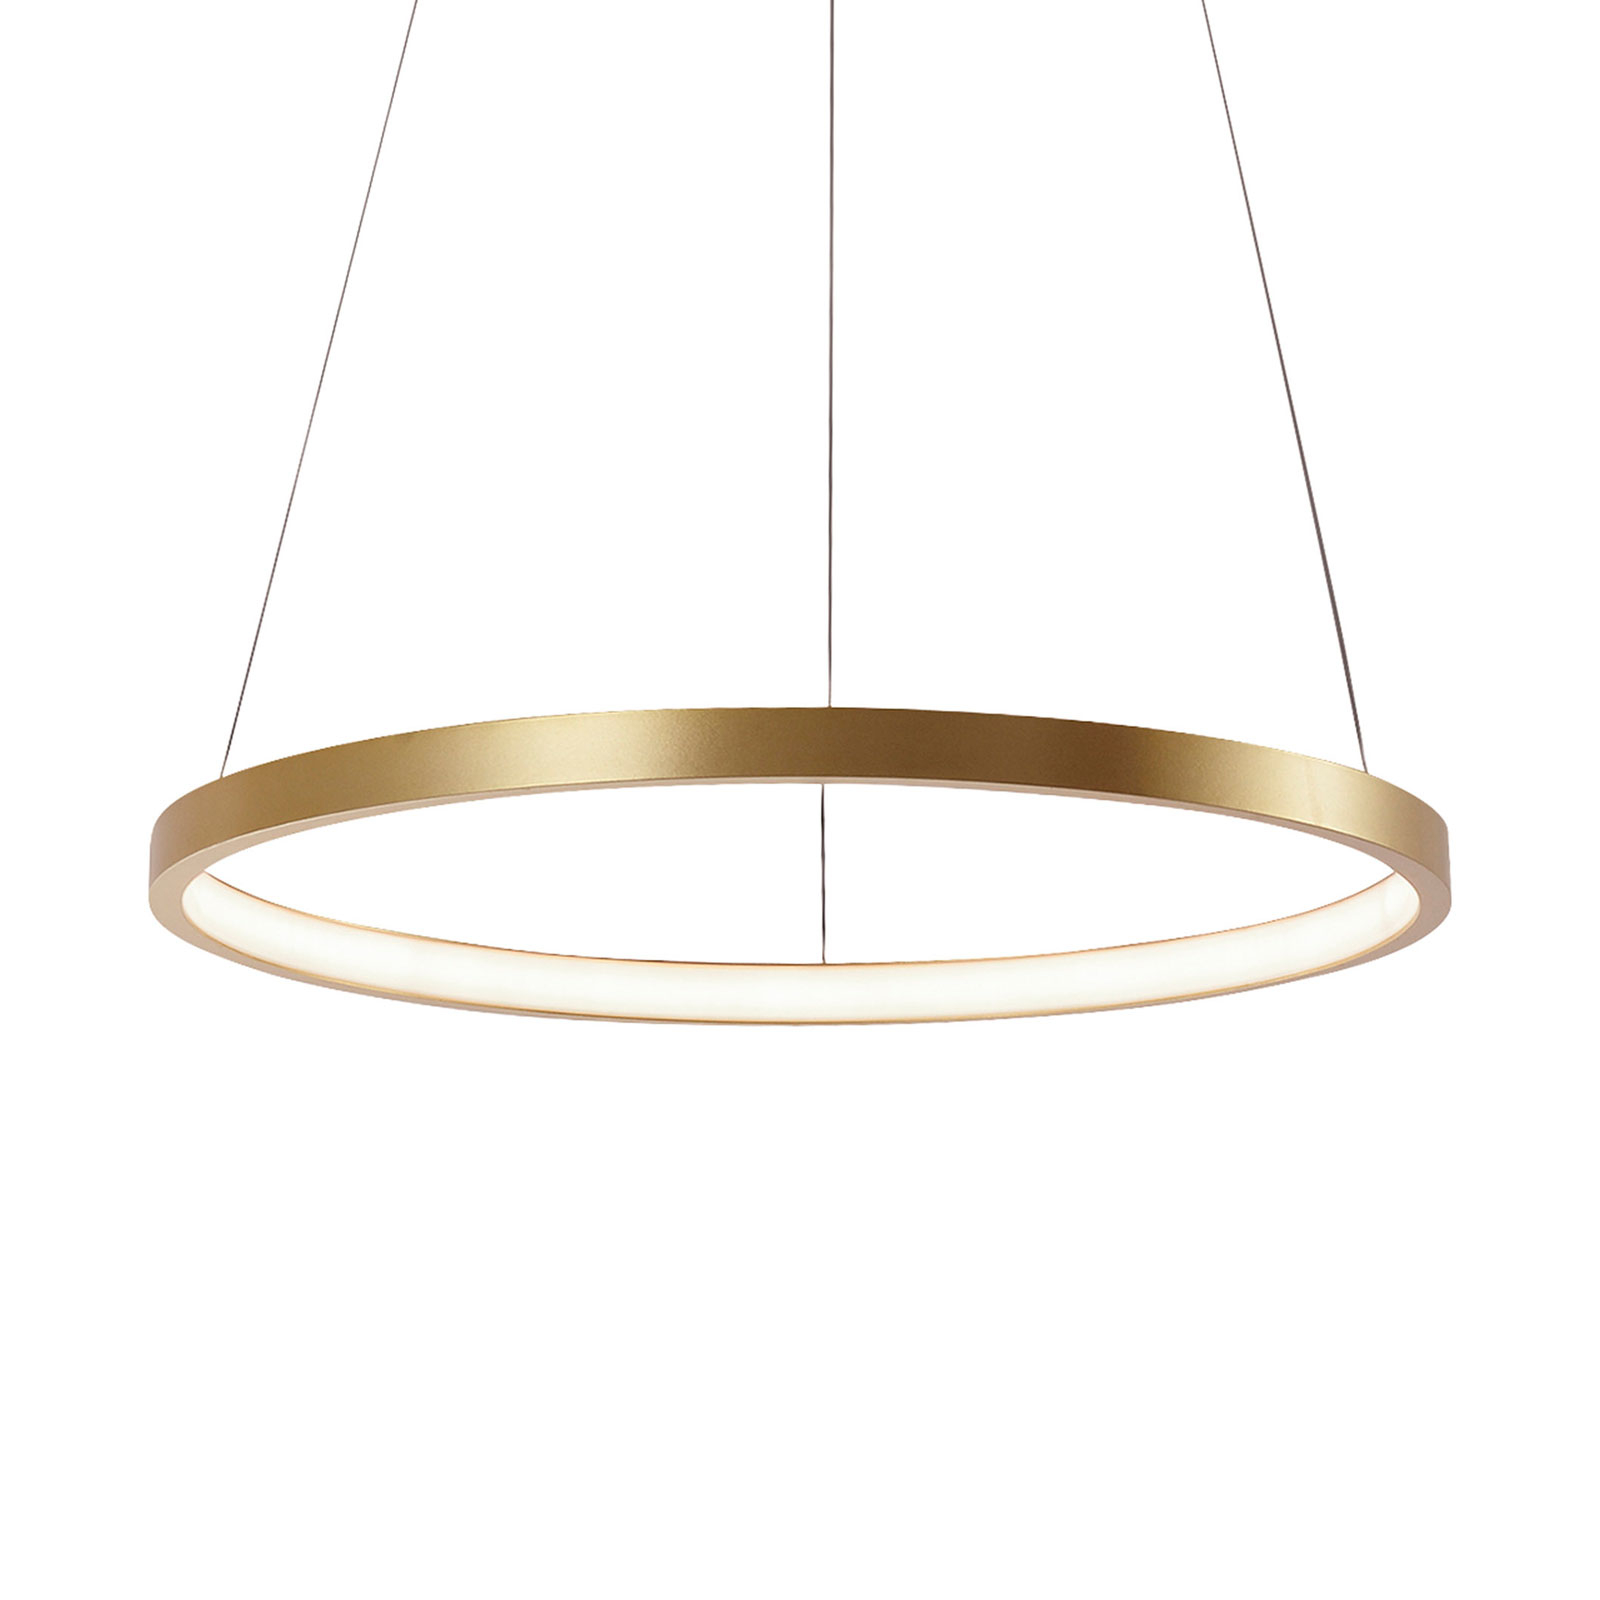 Suspension LED Circle, dorée, Ø 39cm